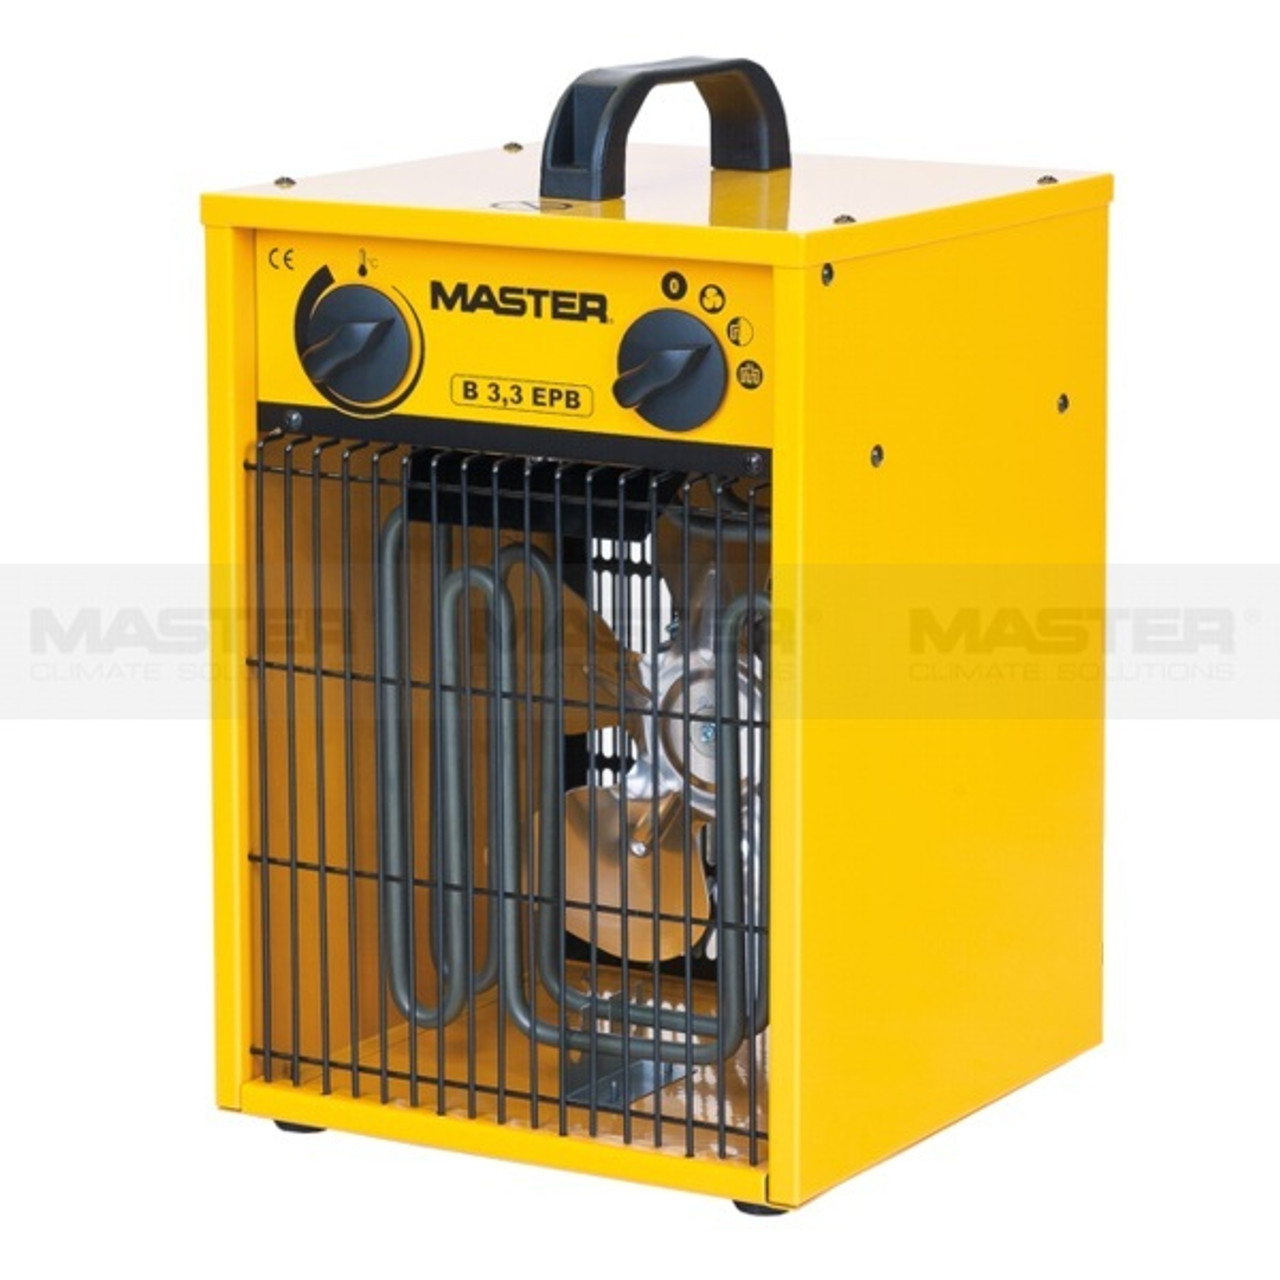 110V MASTERS B3 Epb Electric Fan Heater